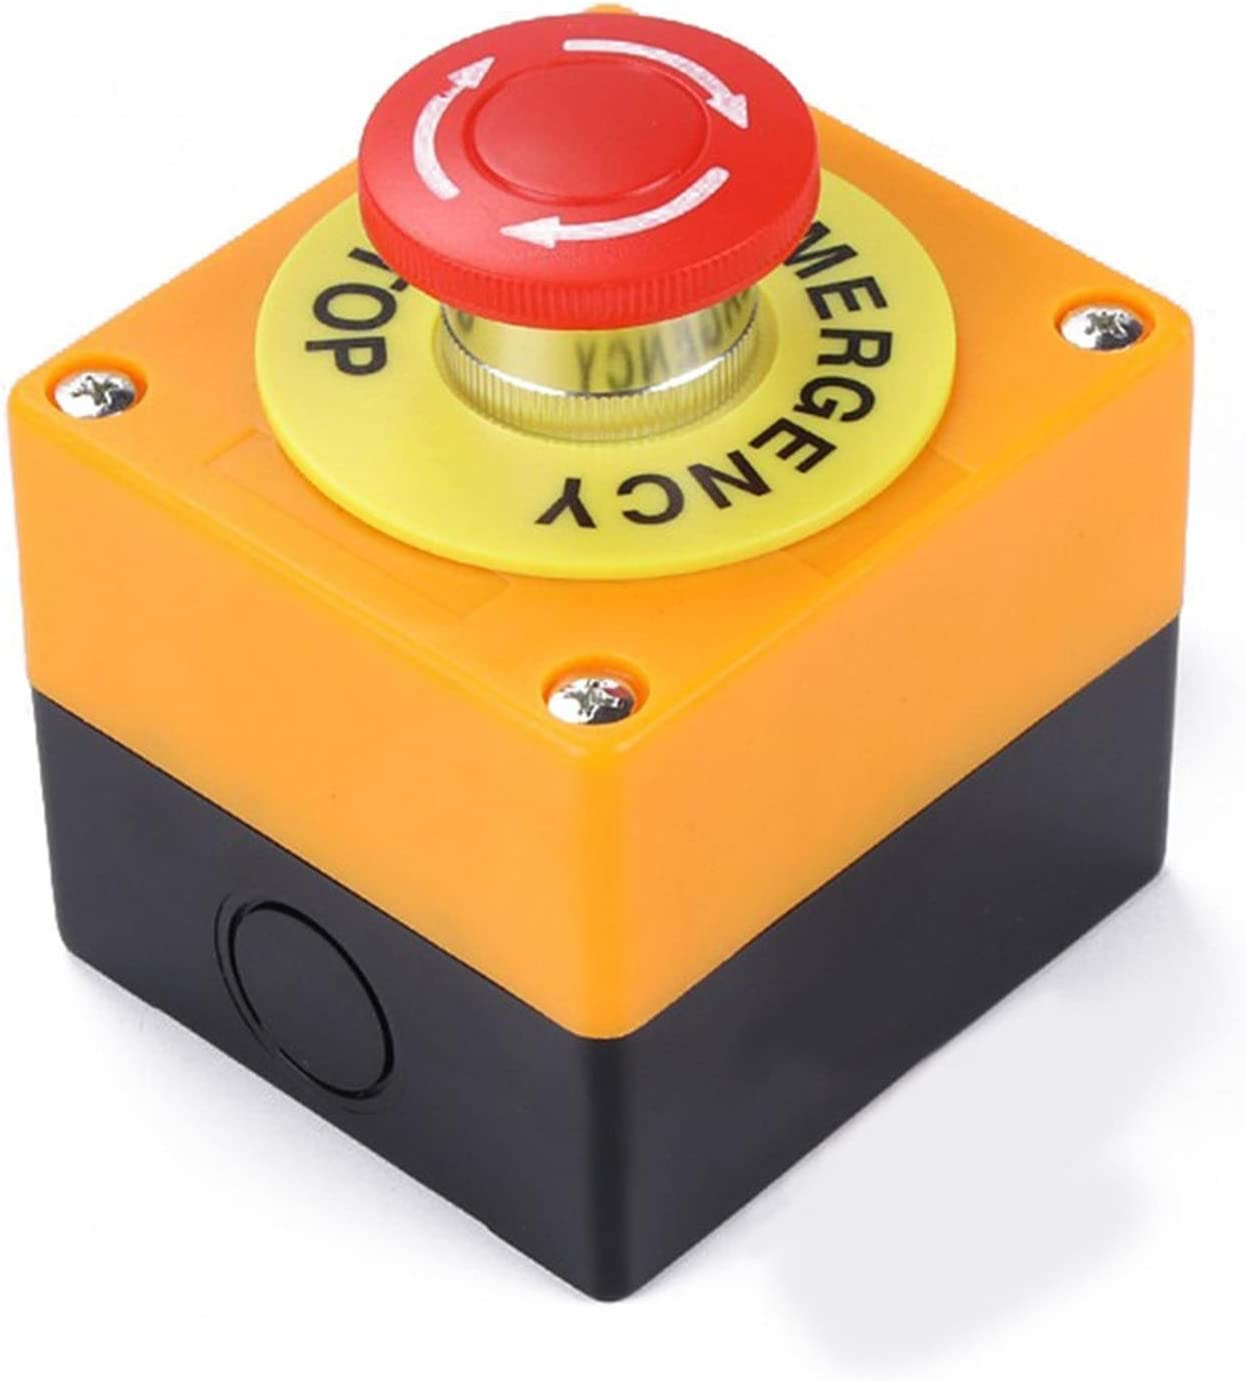 Interruttore a Pulsante 1 NO 1 NC 10A 660V per Arresto di Emergenza Impermeabile